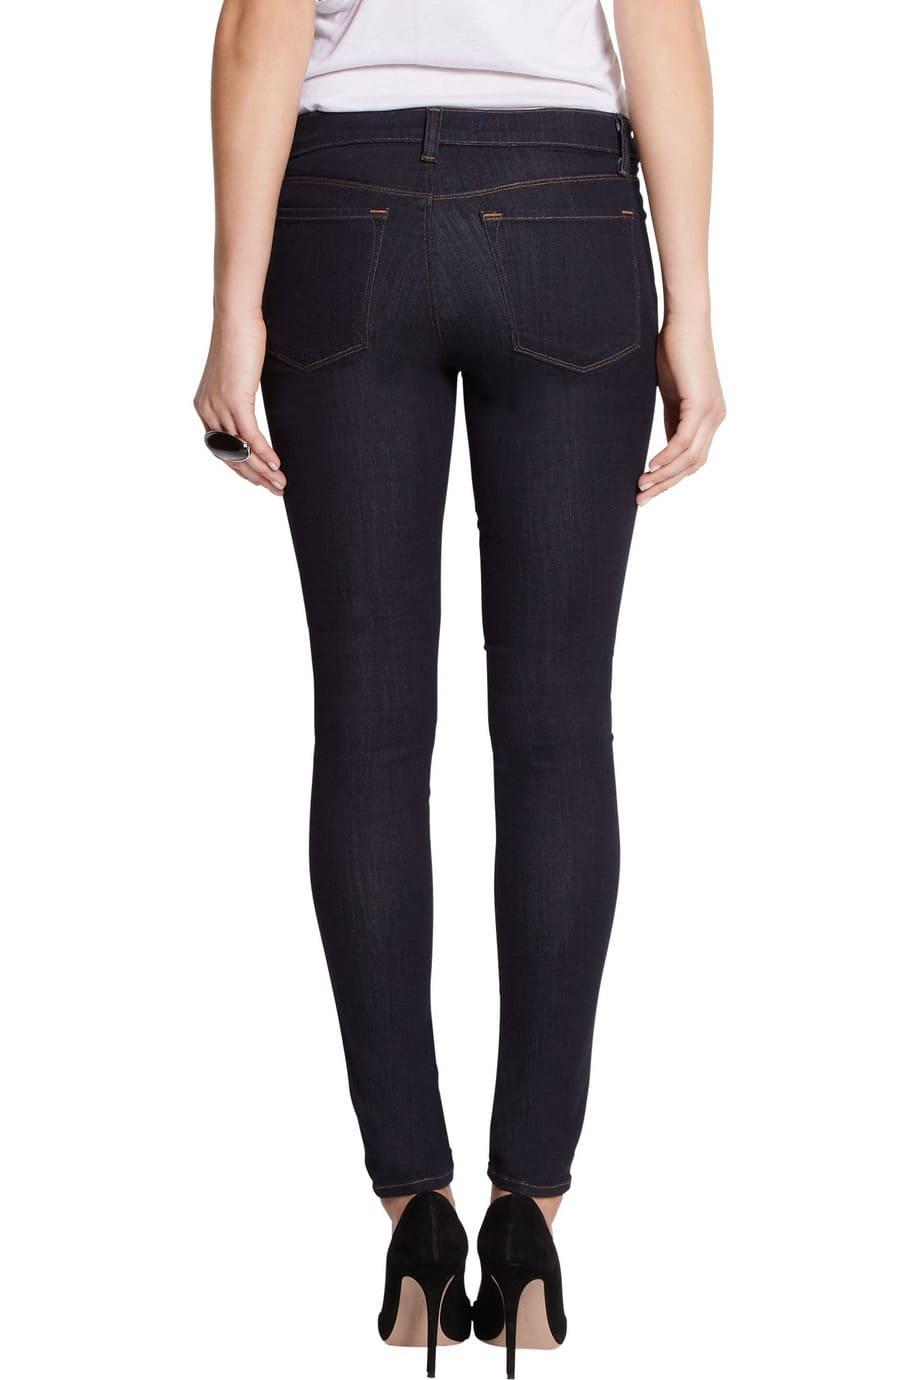 image Arborer le look de (Black Widow) Natasha Romanoff en jeans J Brand 22